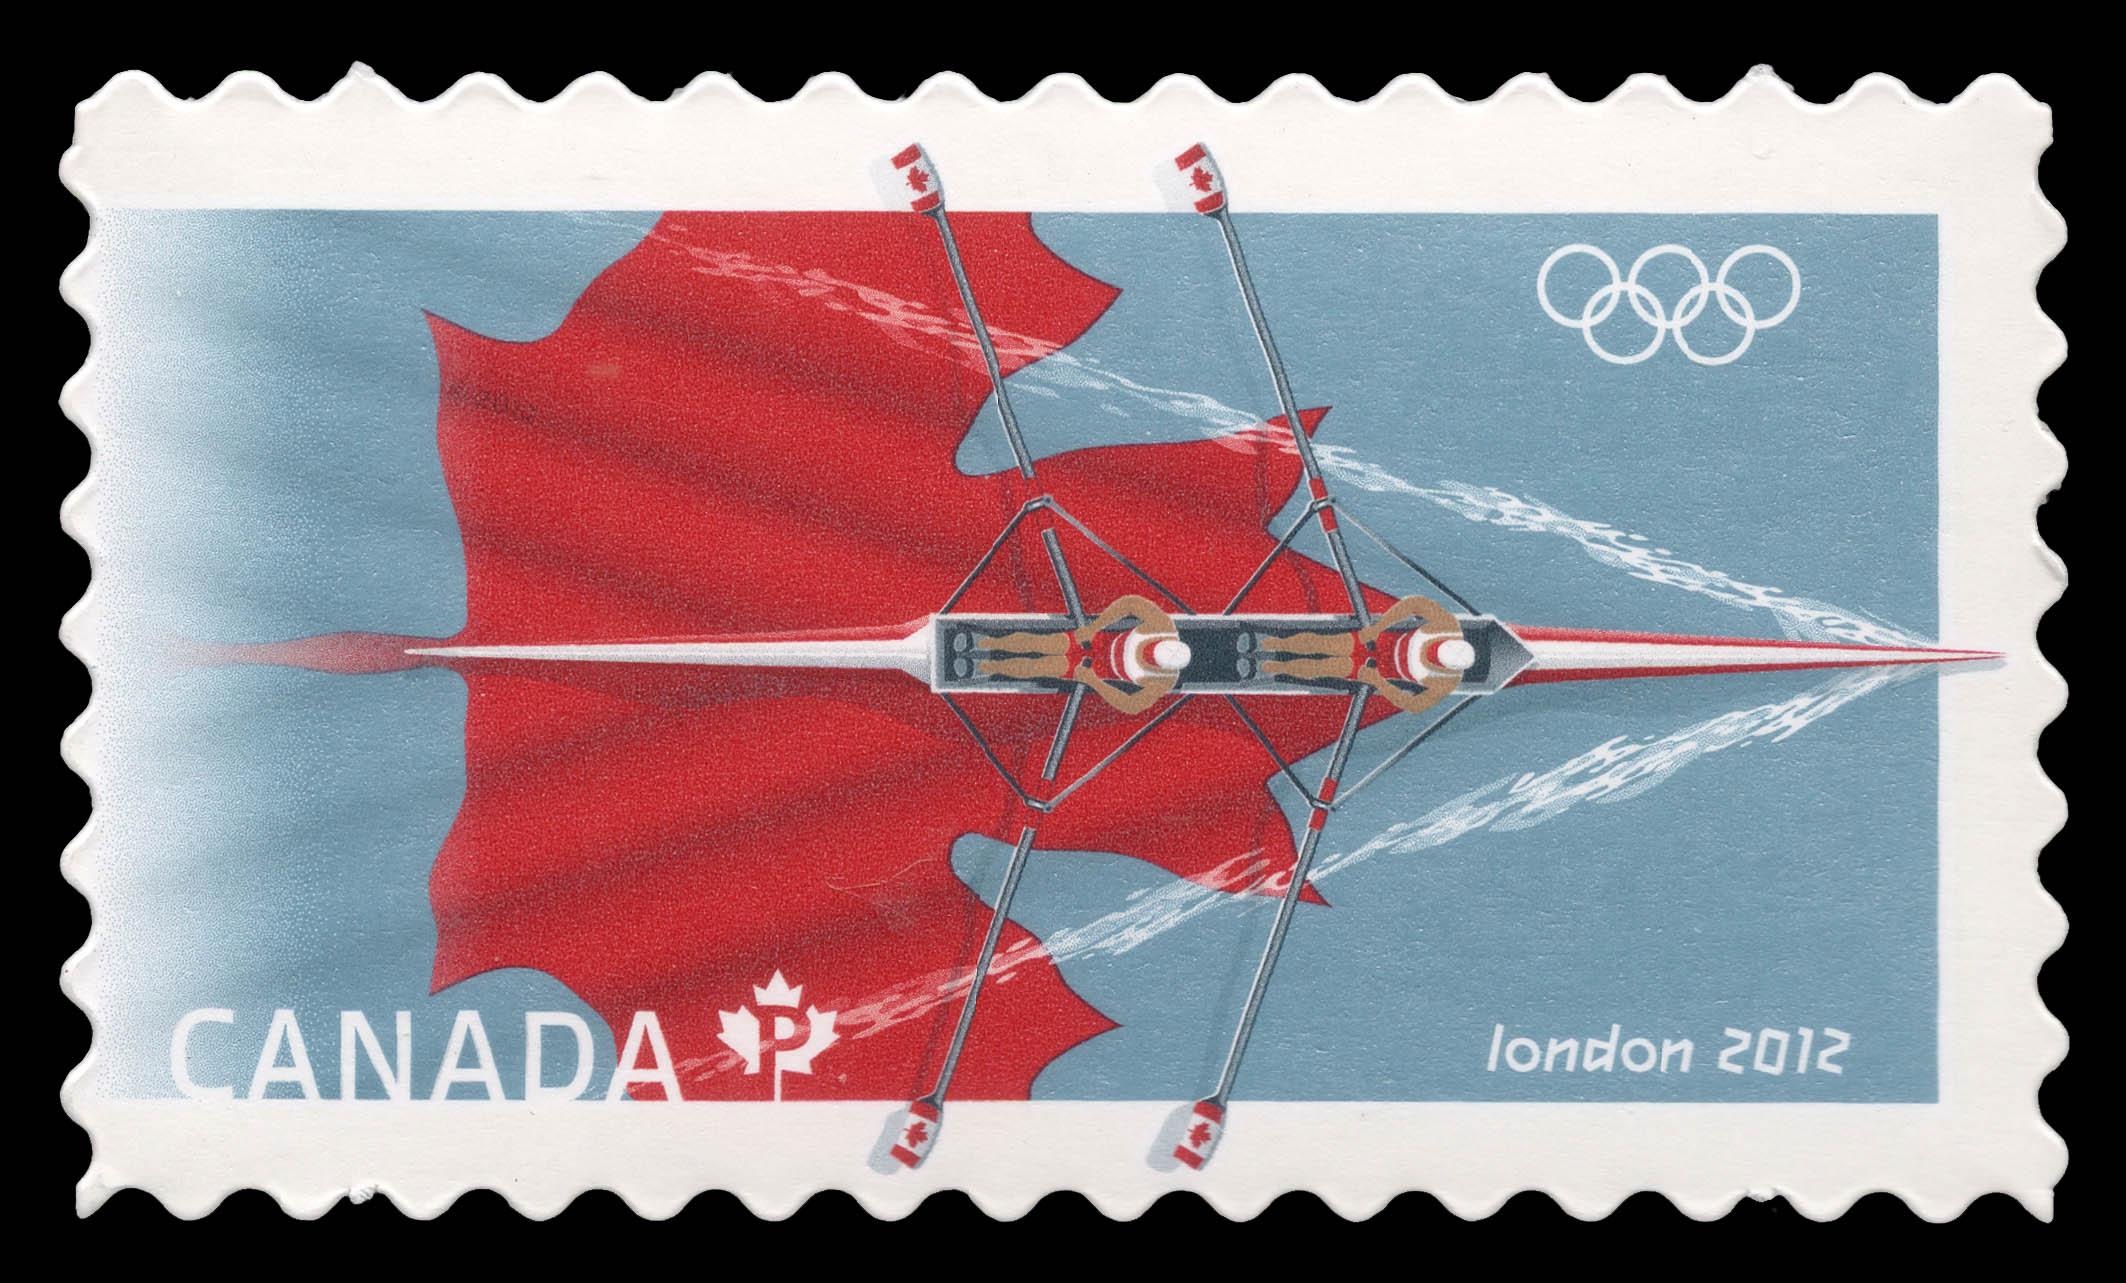 London 2012 Olympics Canada Postage Stamp